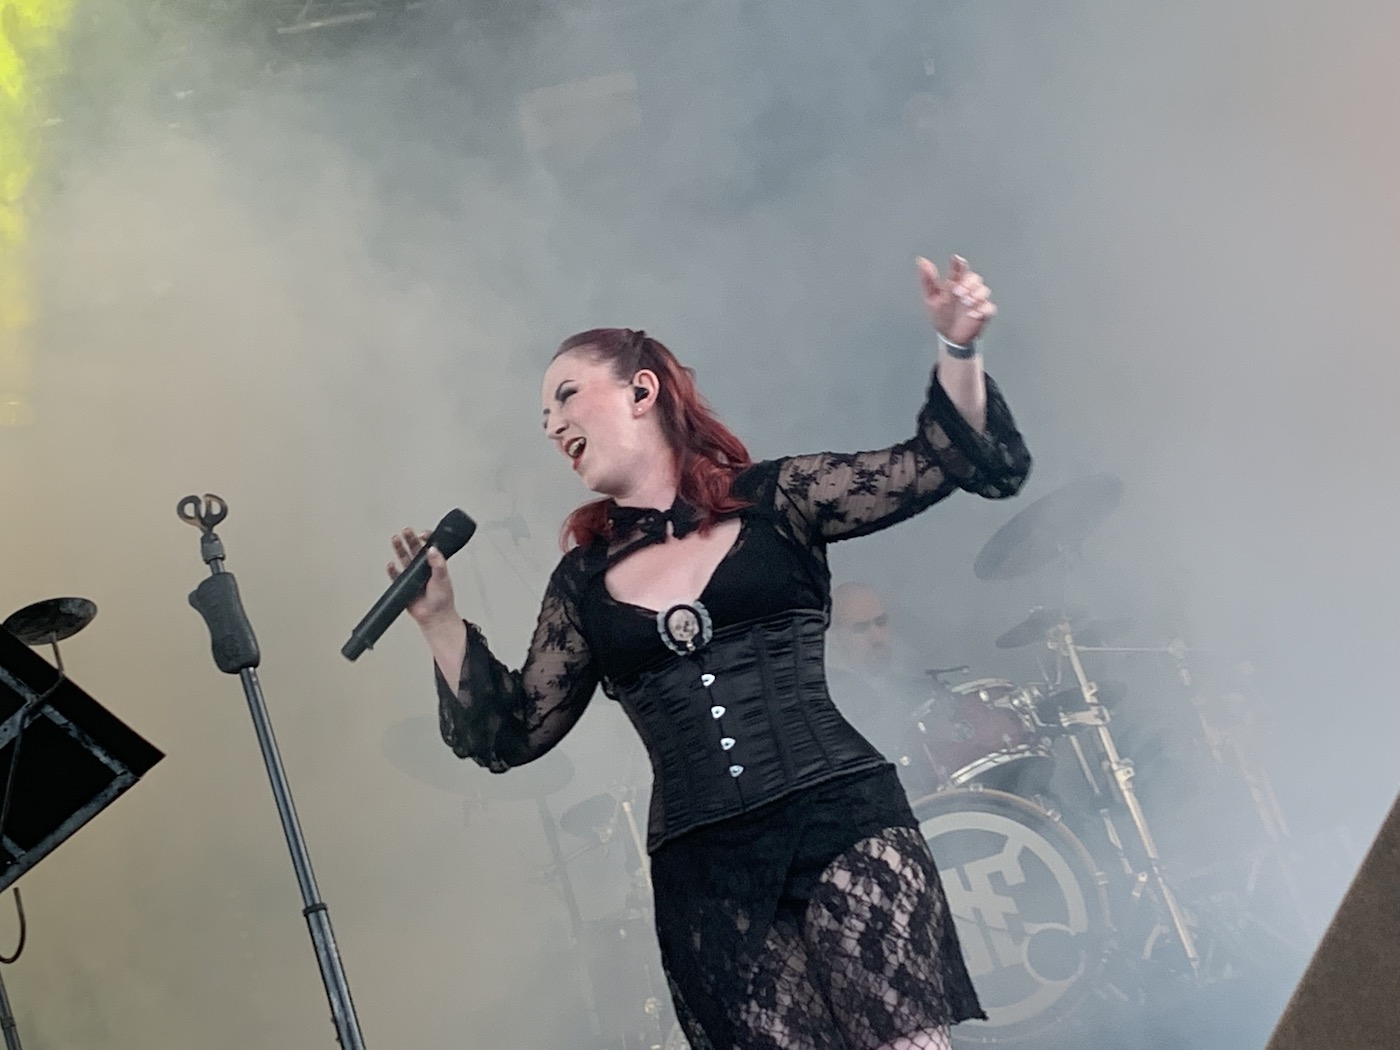 mark_benecke_amphi_festival_koeln_2019 - 84.jpg